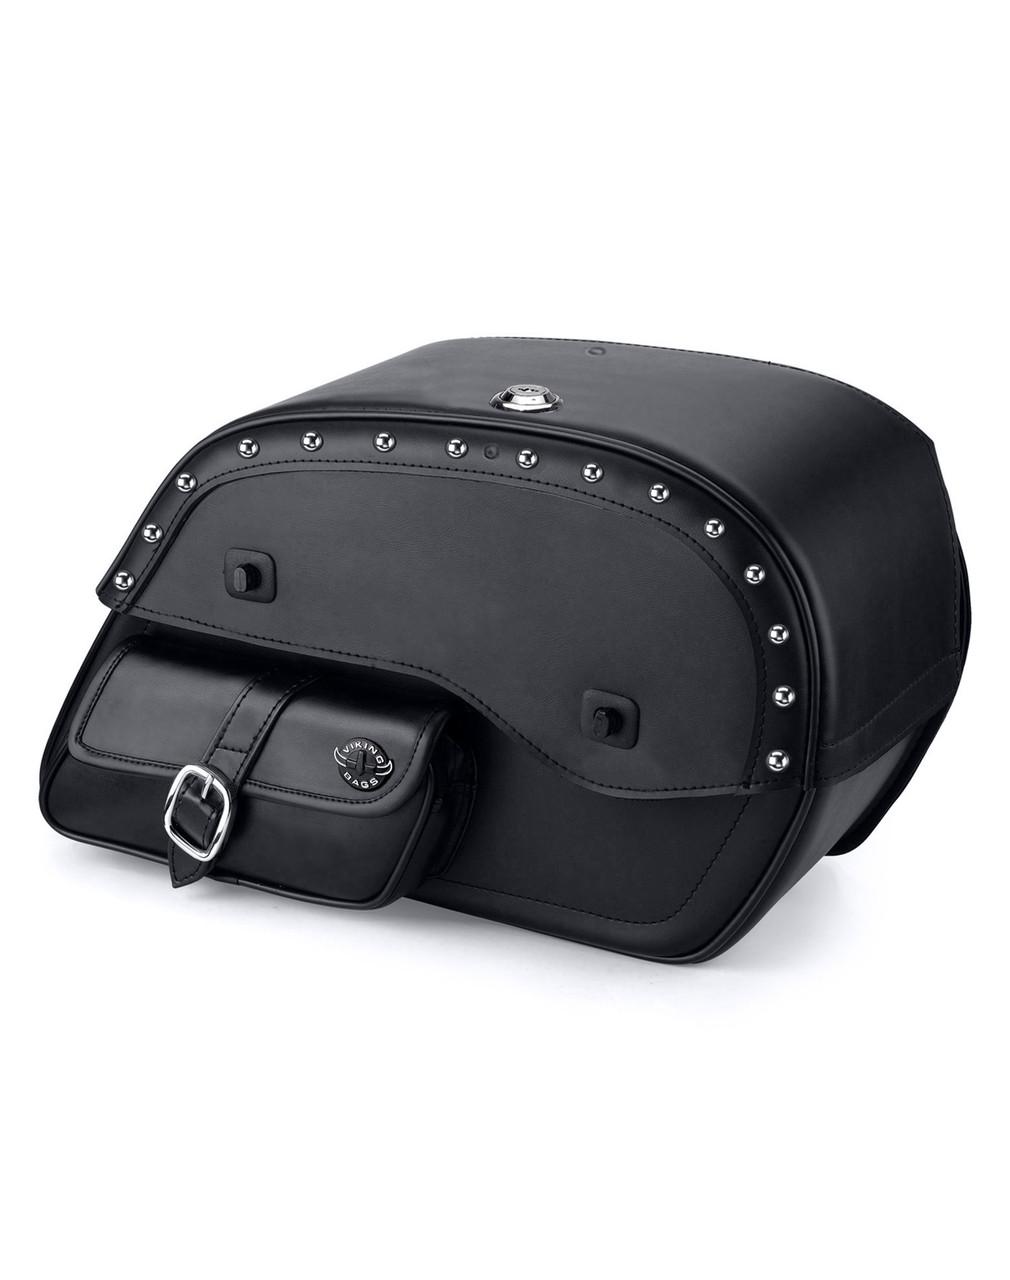 Kawasaki Vulcan S ABS Cafe Viking Side Pocket Studded Large Motorcycle Saddlebags Main bag  View